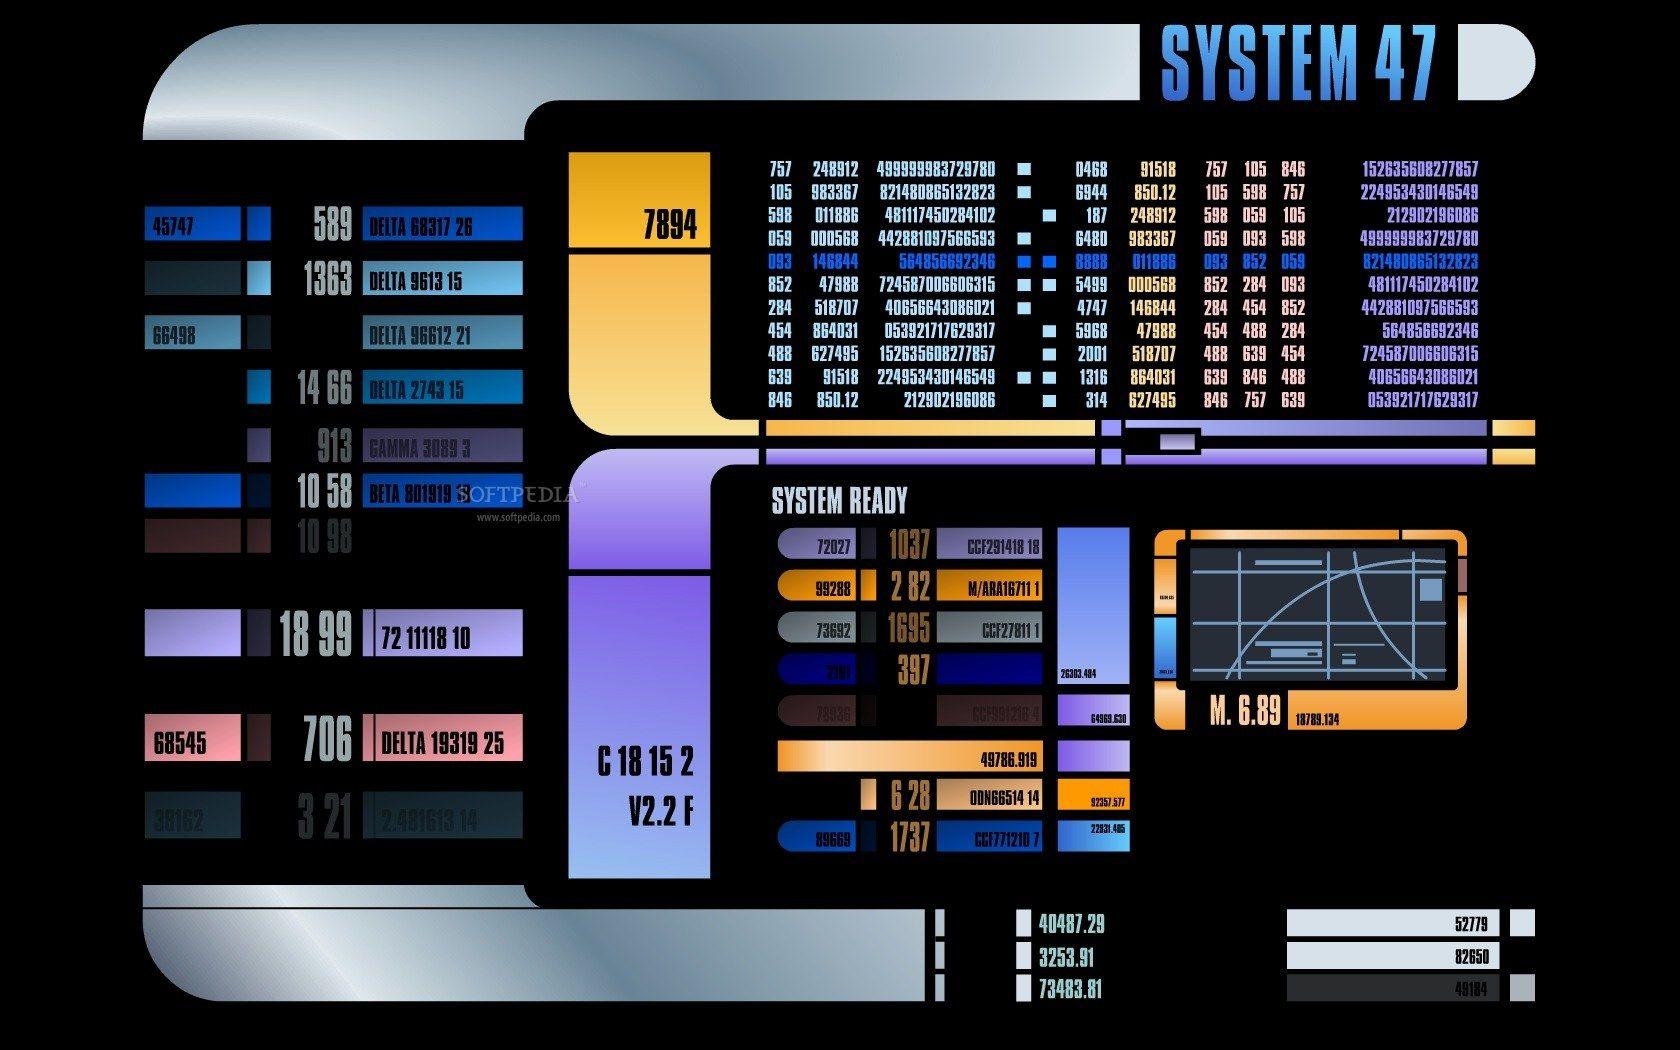 Star Trek Lcars Wallpaper Star Trek Wallpaper Star Trek Star Trek Universe